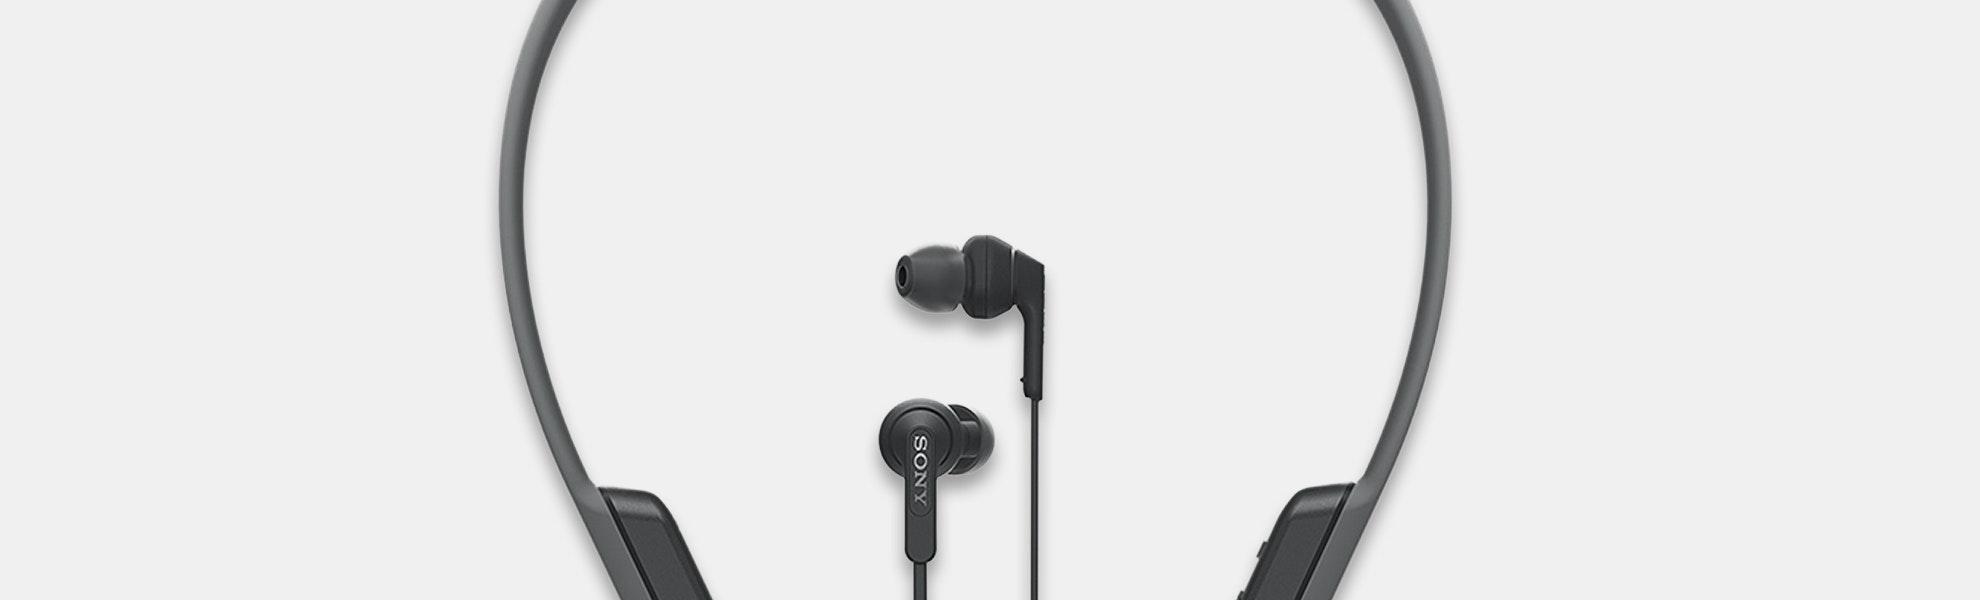 Sony XB70BT Extra Bass Bluetooth In-Ear Headphones